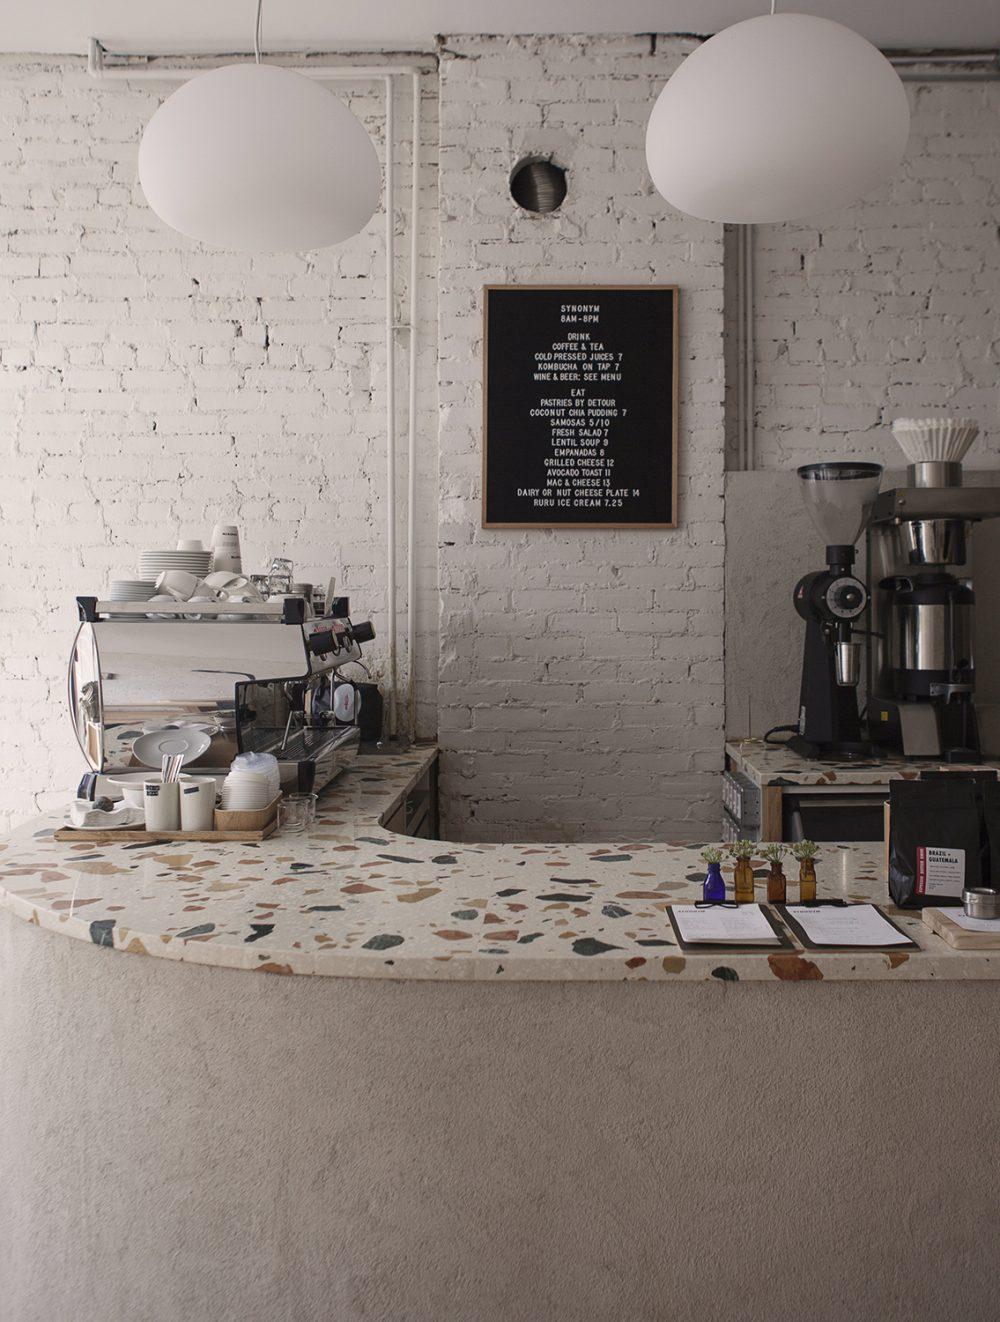 Synonym café - Atelier Barda architecture - Toronto